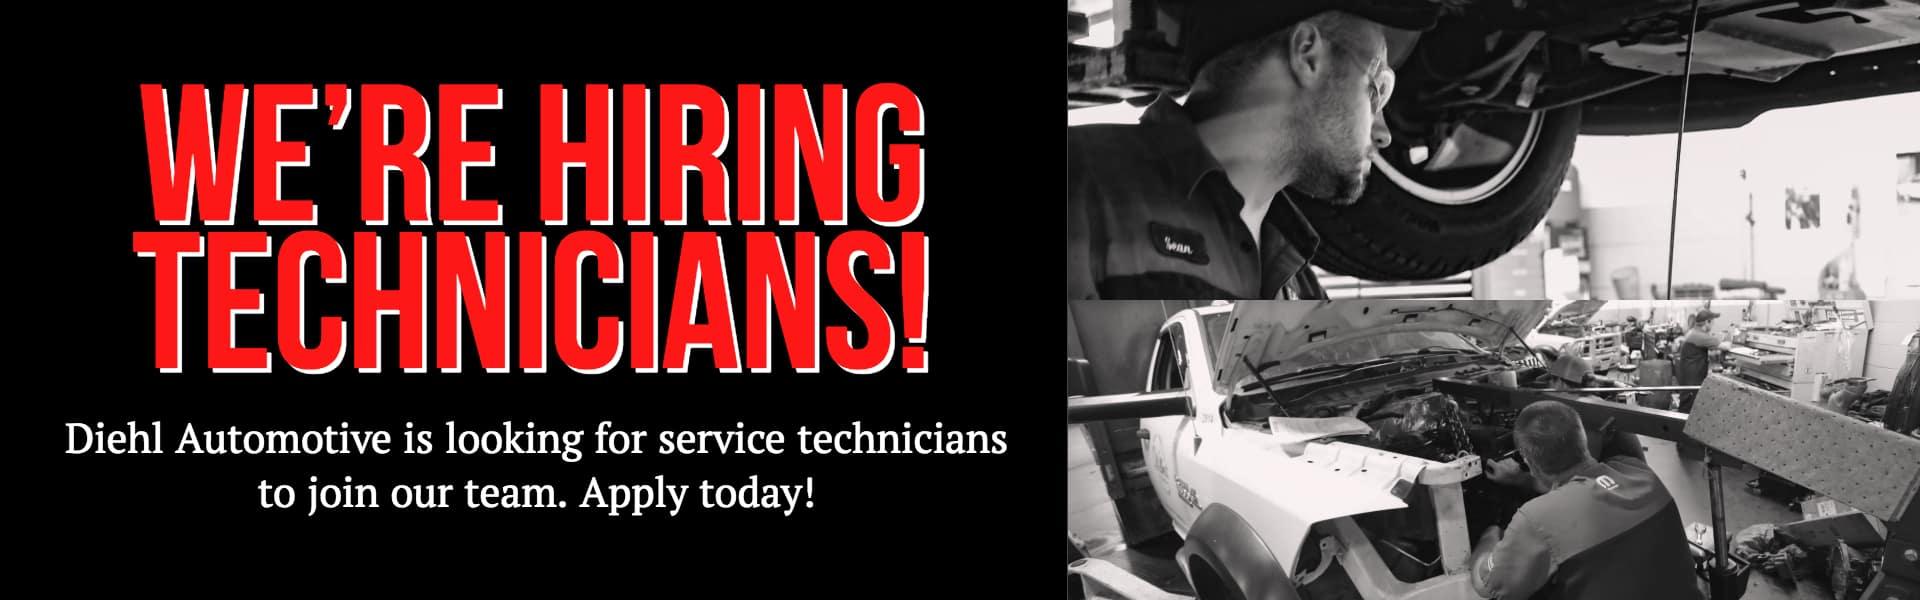 service technician now hiring diehl automotive service tech butler grove city robinson salem ohio jobs pennsylvania jobs now hiring